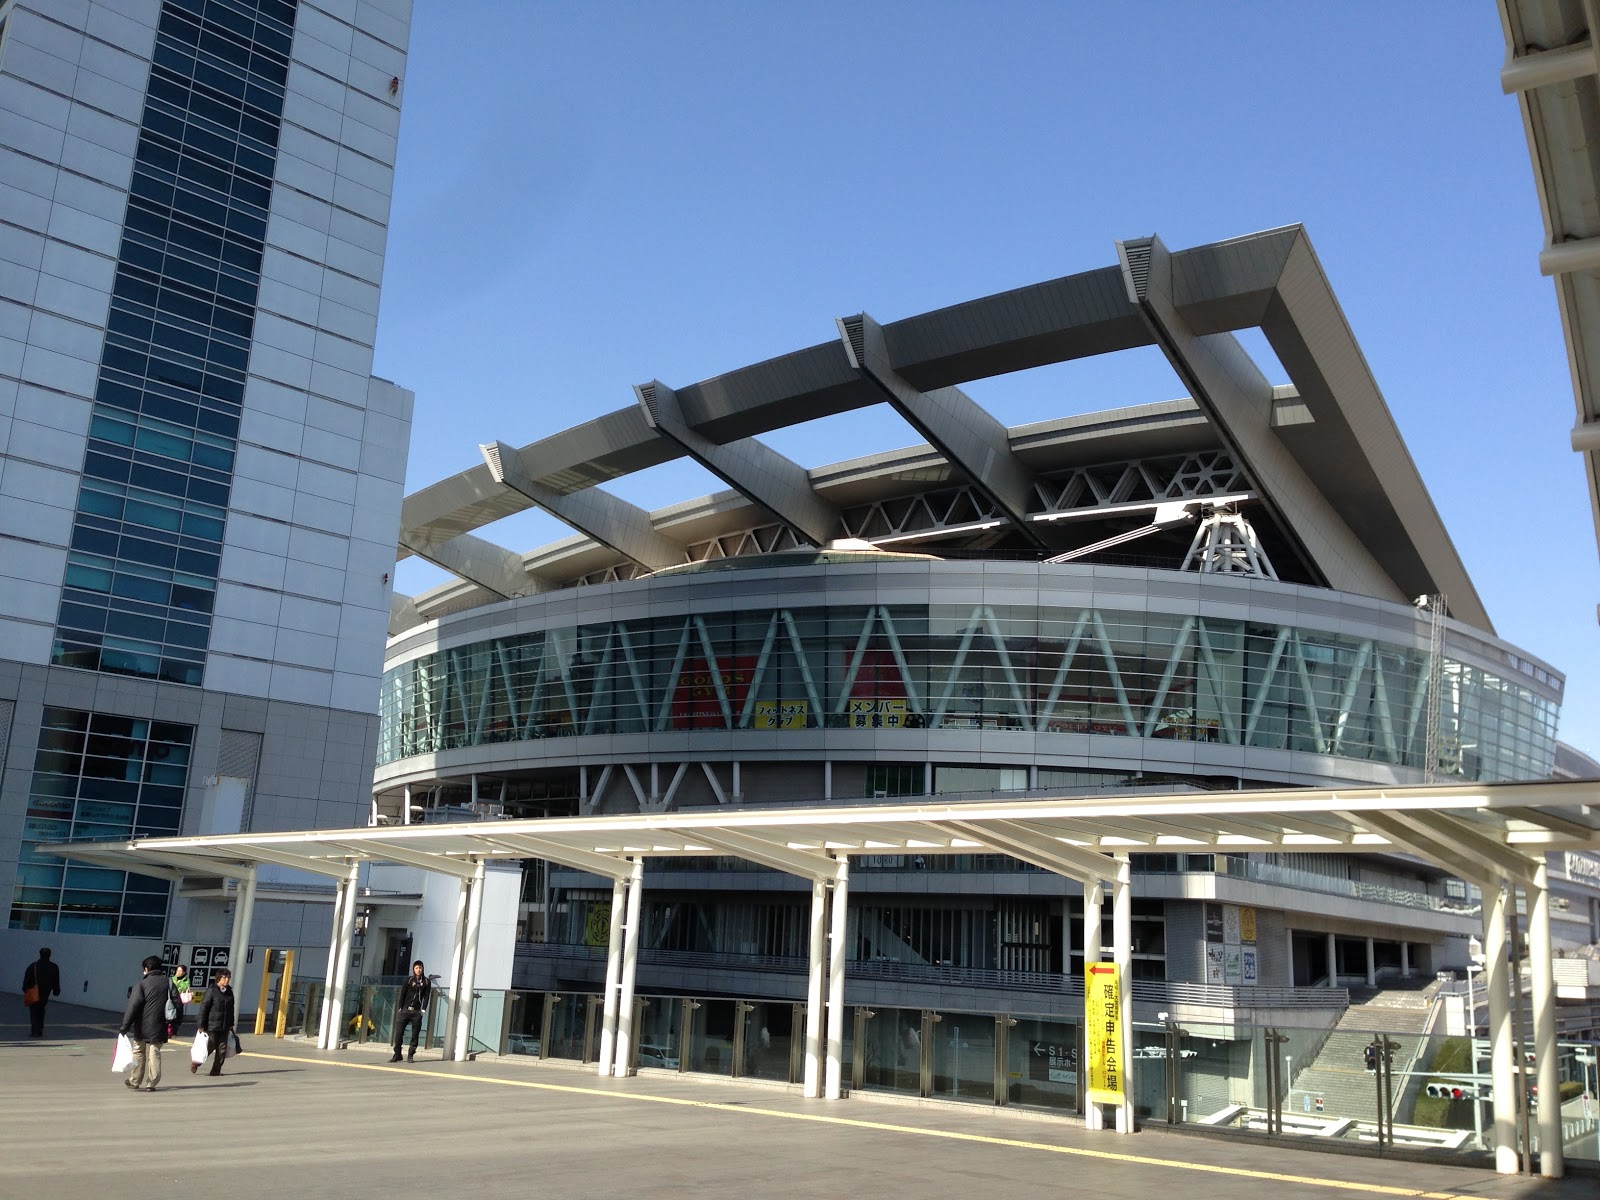 UFC on Fuel 8@Saitama Super Arena, Saitama, Japan | Tokyo Family Guy - Expat Life in the Slow Lane